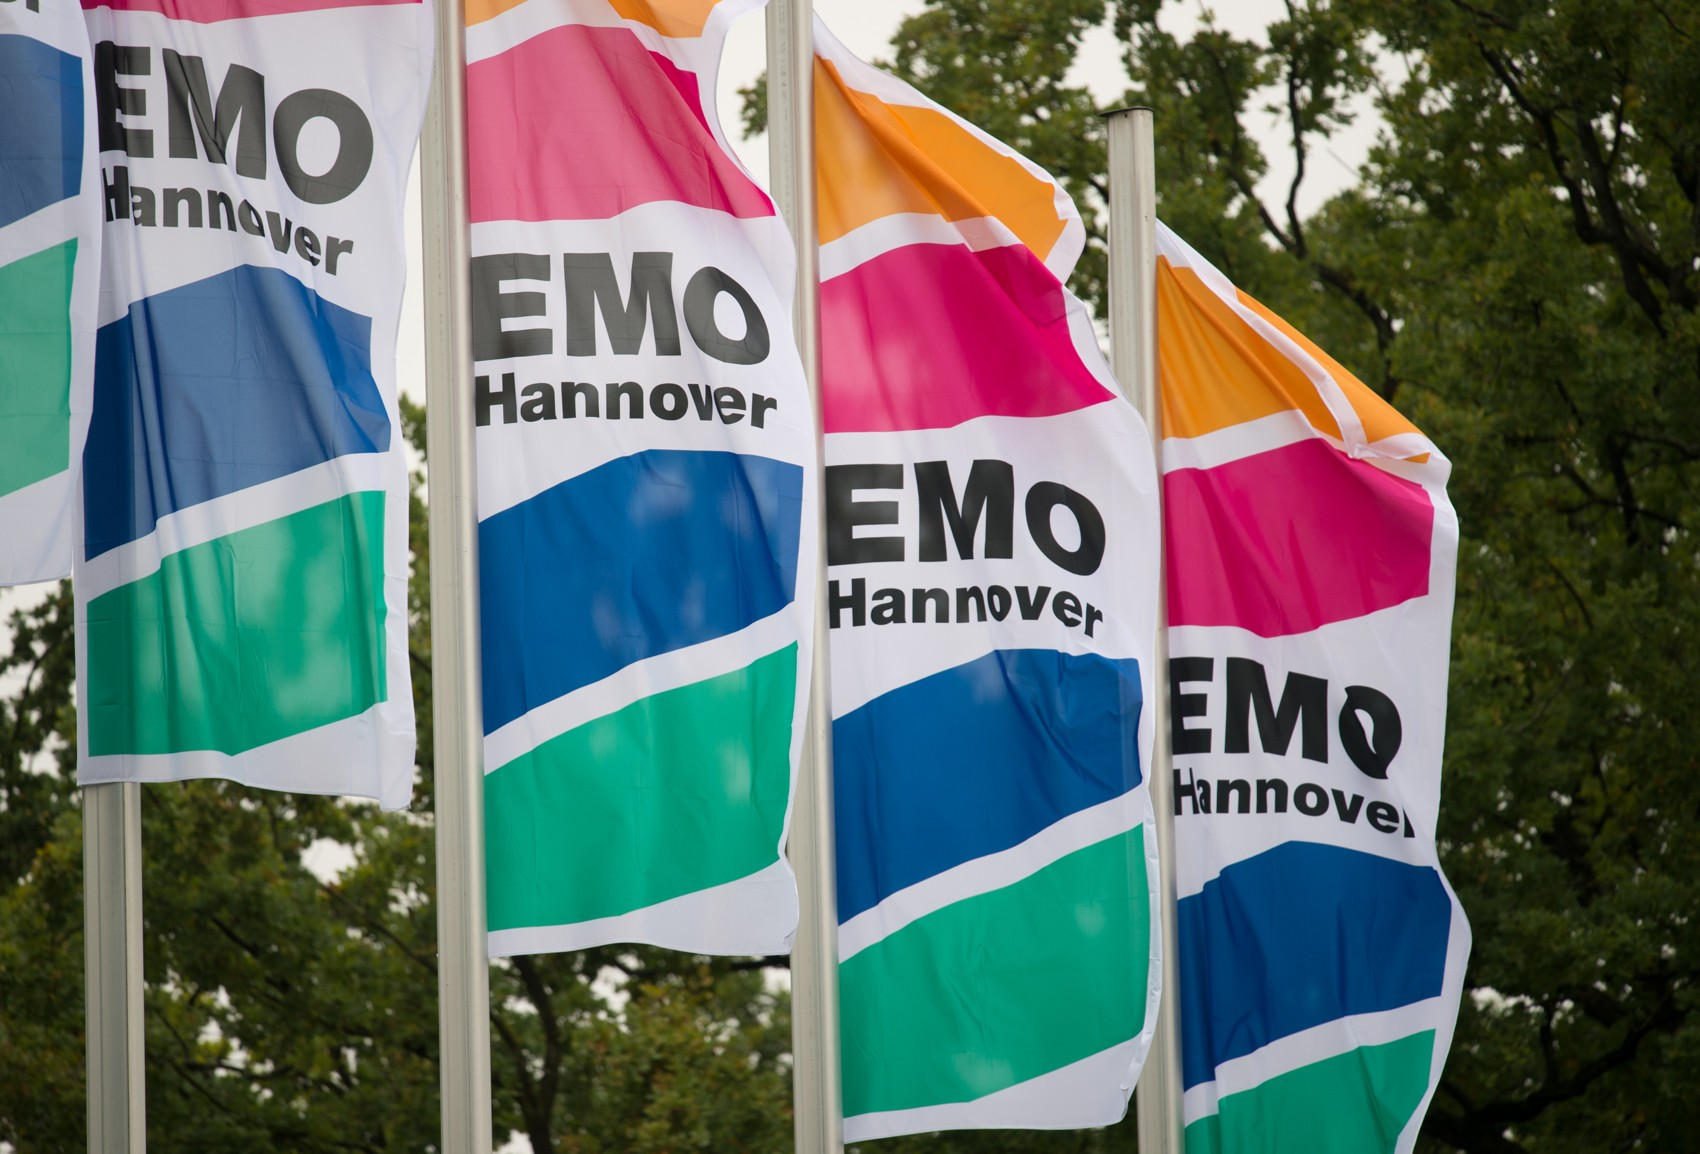 EMO Hannover flags. Photo via EMO.